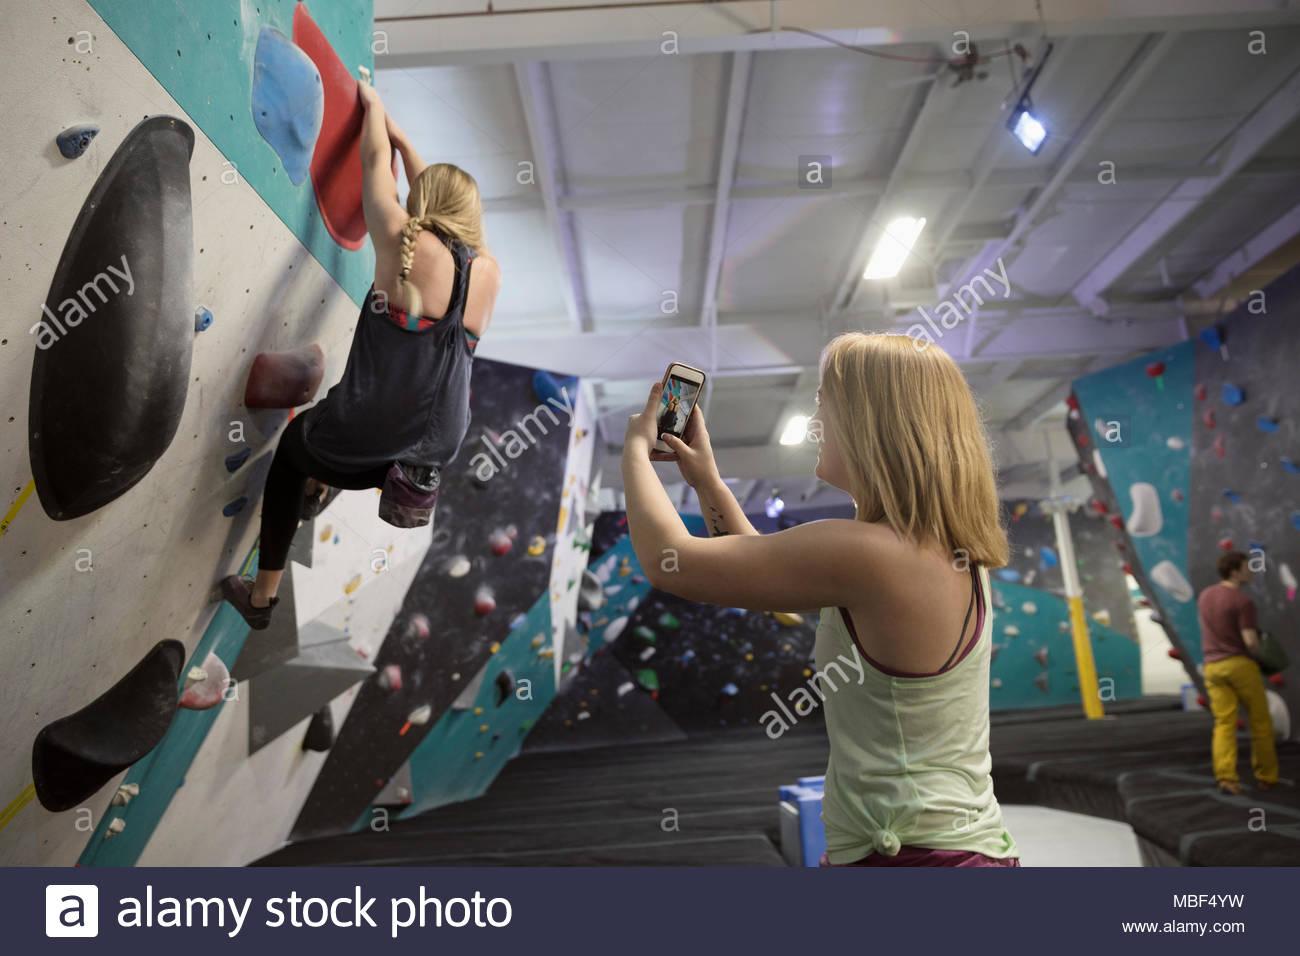 Female rock climber with camera phone videoing partner climbing wall at climbing gym - Stock Image